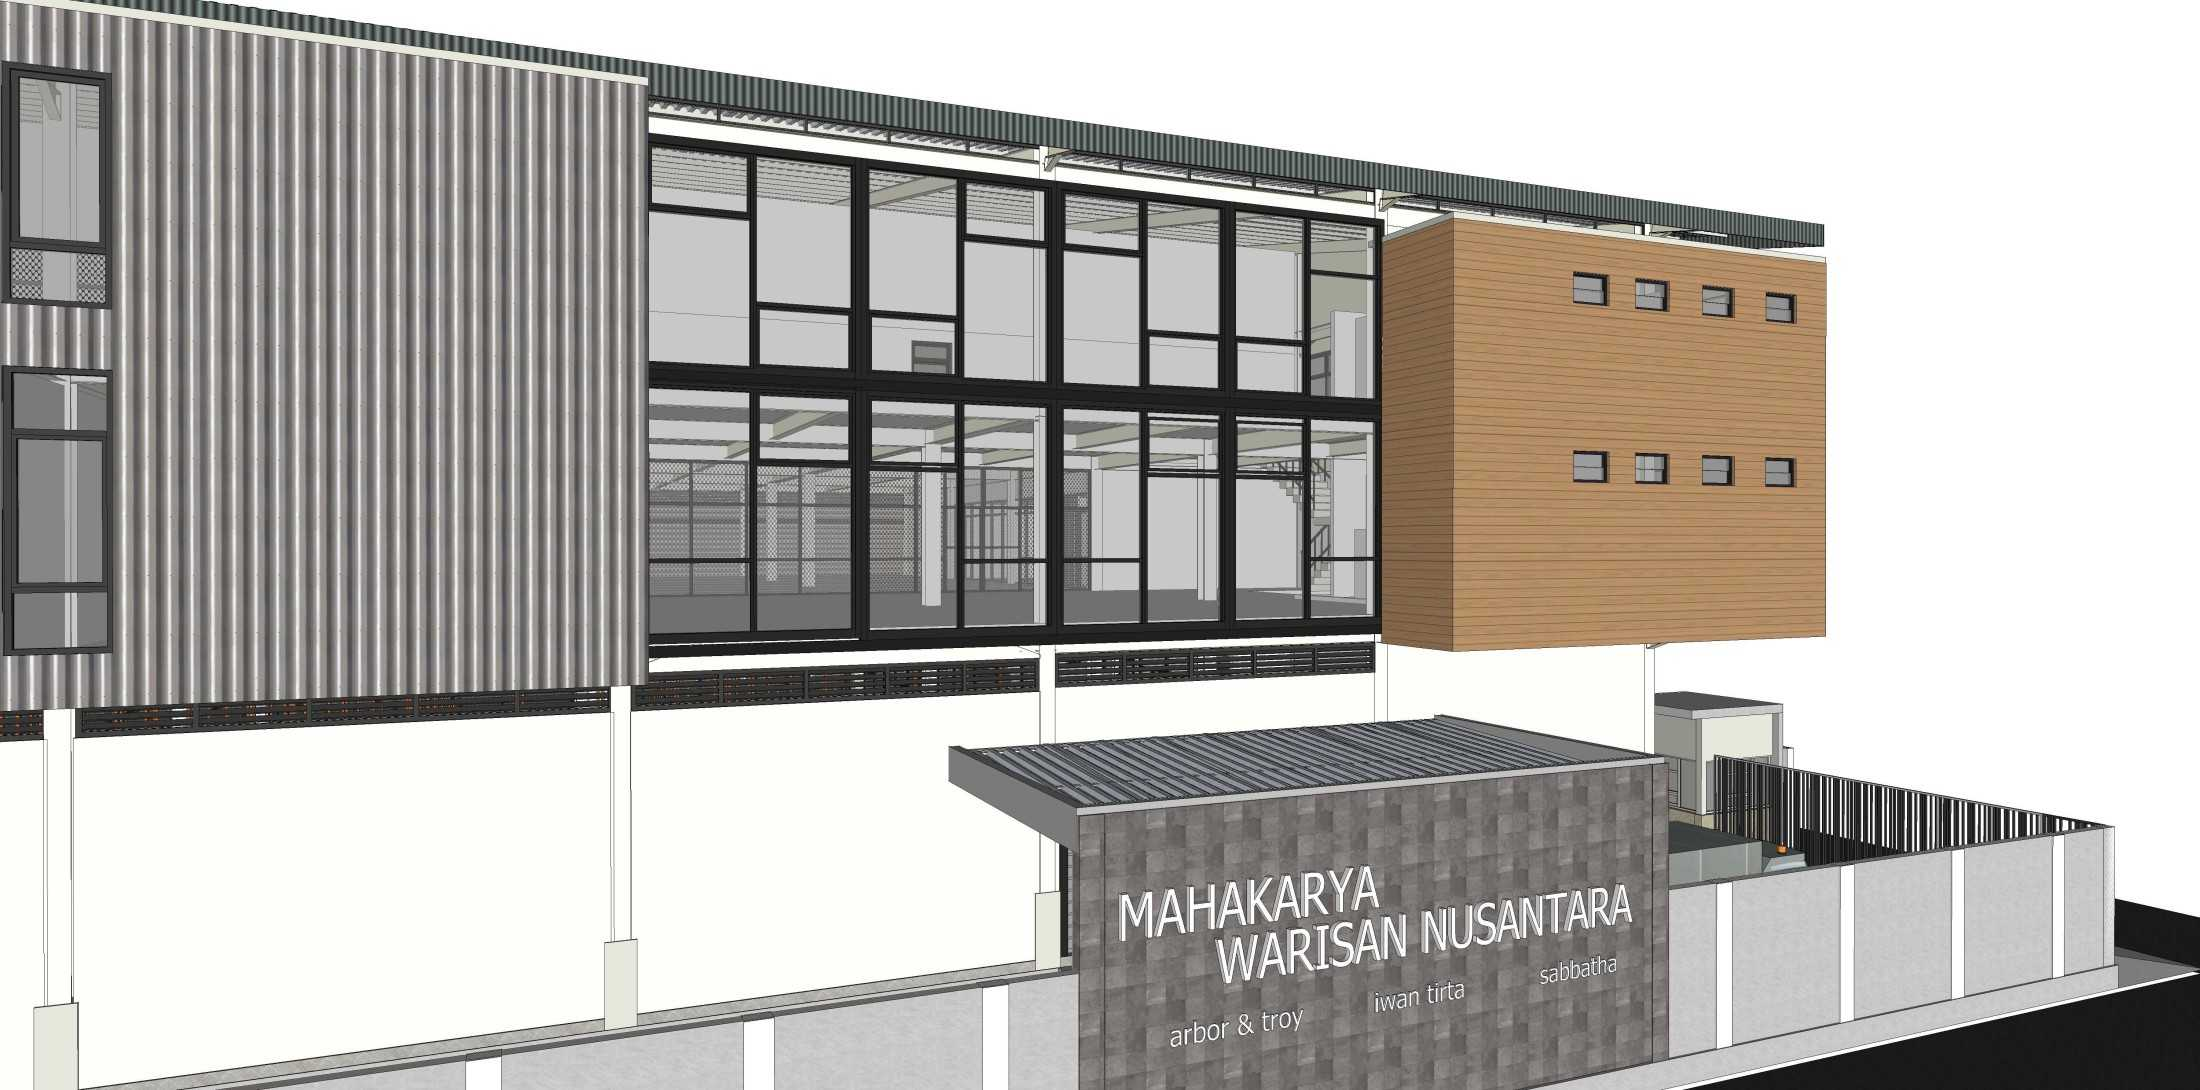 Darmawangsa Design & Development Gudang Pt. Mwn Serua, Bojongsari, Kota Depok, Jawa Barat, Indonesia Serua, Bojongsari, Kota Depok, Jawa Barat, Indonesia Darmawangsa-Design-Development-Gudang-Pt-Mwn Minimalist 57818